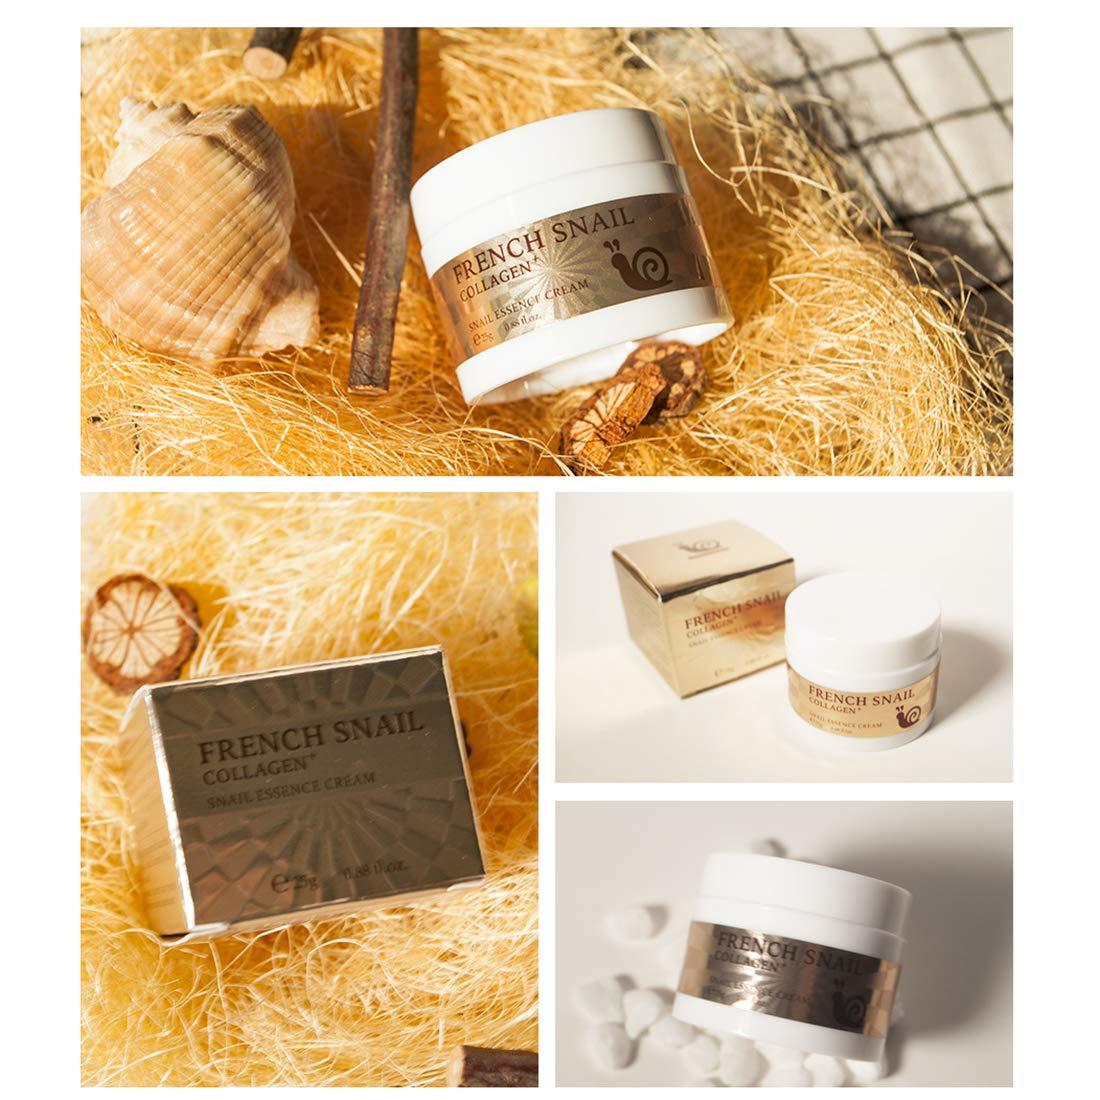 Loweryeah Snail Repair Anti-aging Cream 25g Collagen Moisturizing Nourish Repair Damaged Face Care Hyaluronic Acid Cream by Loweryeah (Image #6)